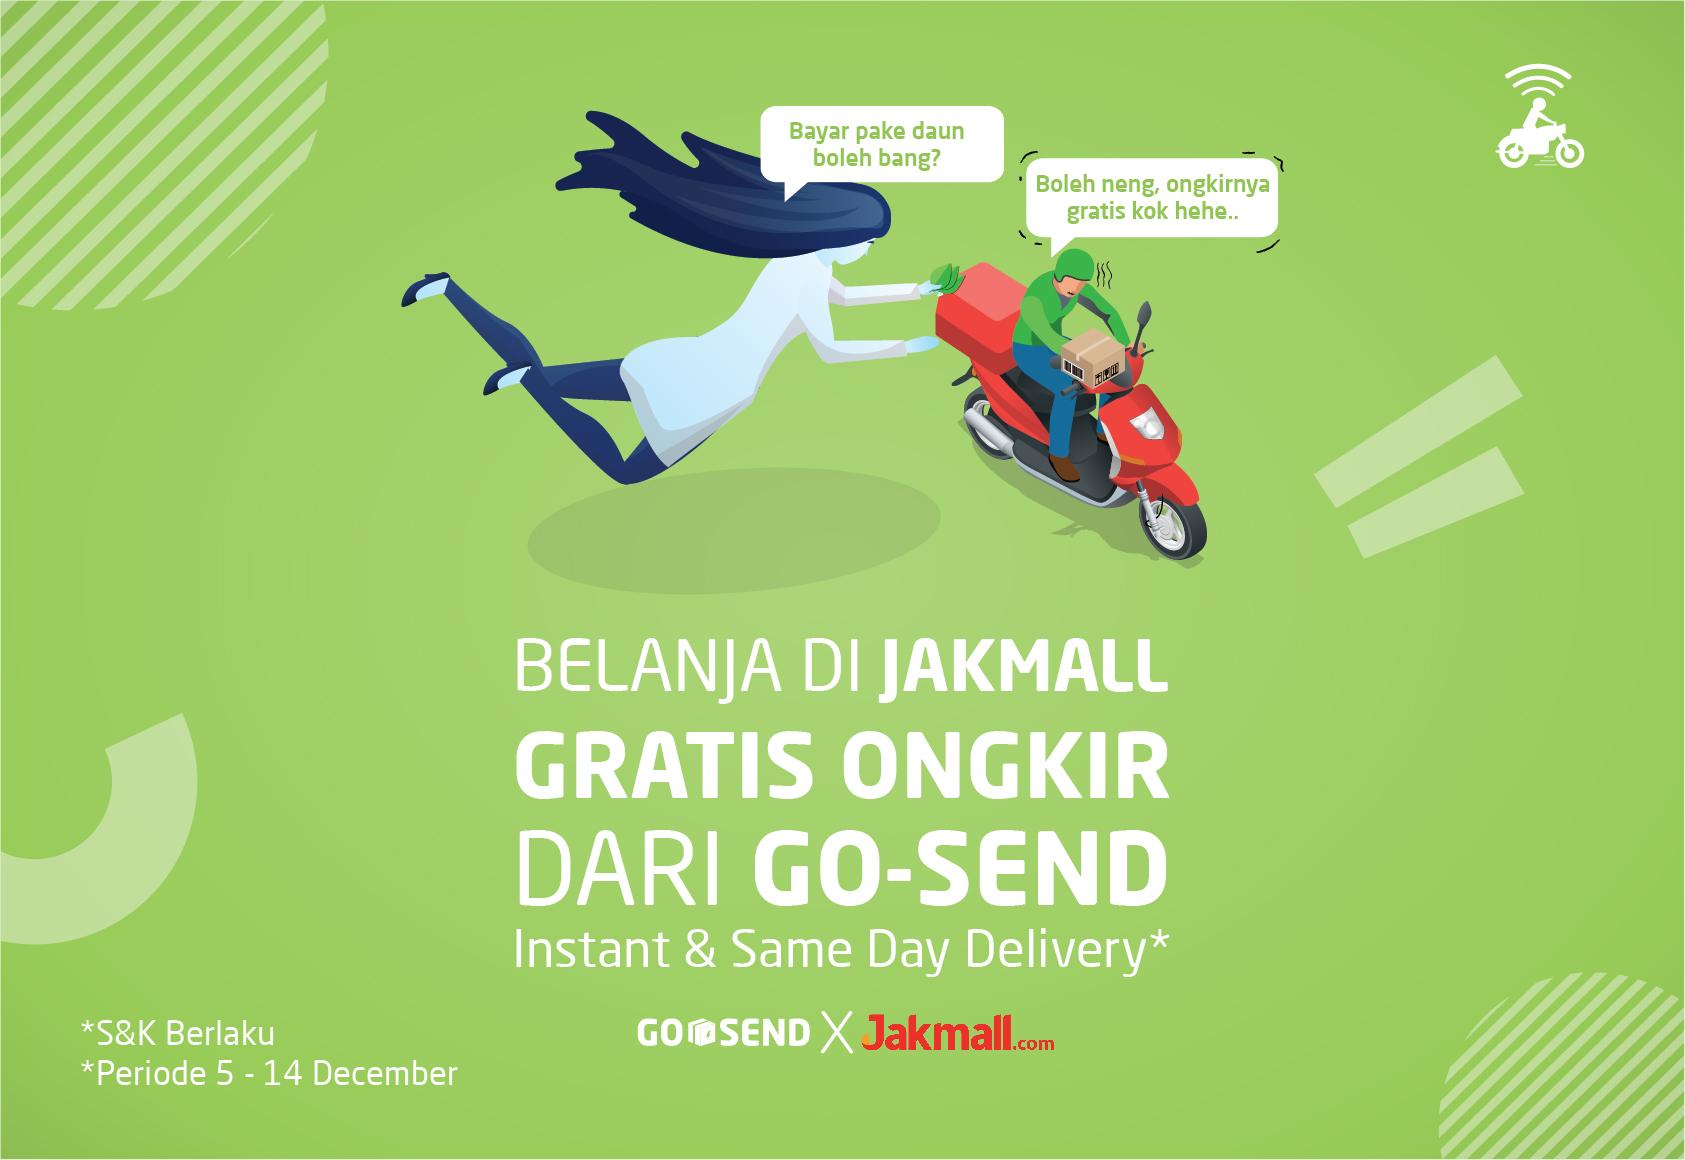 GO-SEND x Jakmall